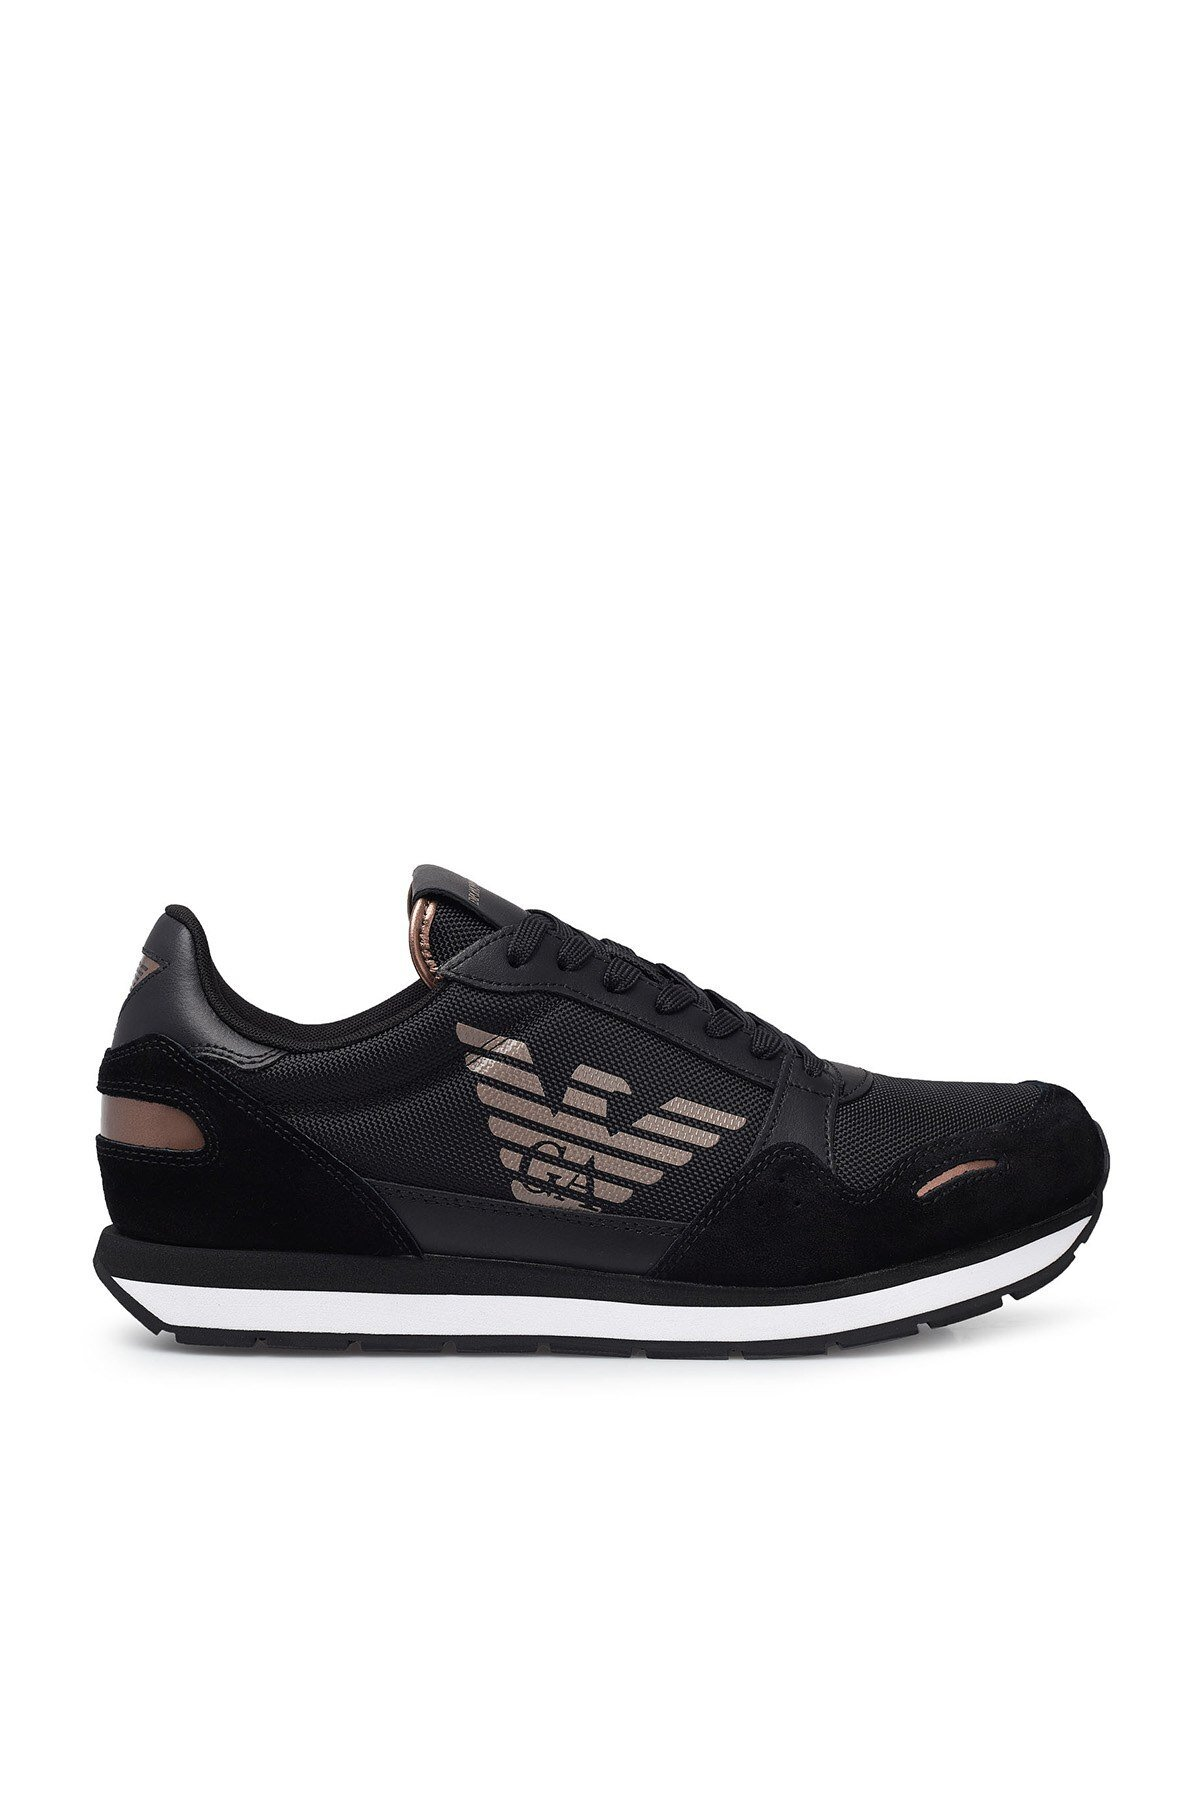 Emporio Armani Sneaker Erkek Ayakkabı X4X215 XM561 N218 SİYAH